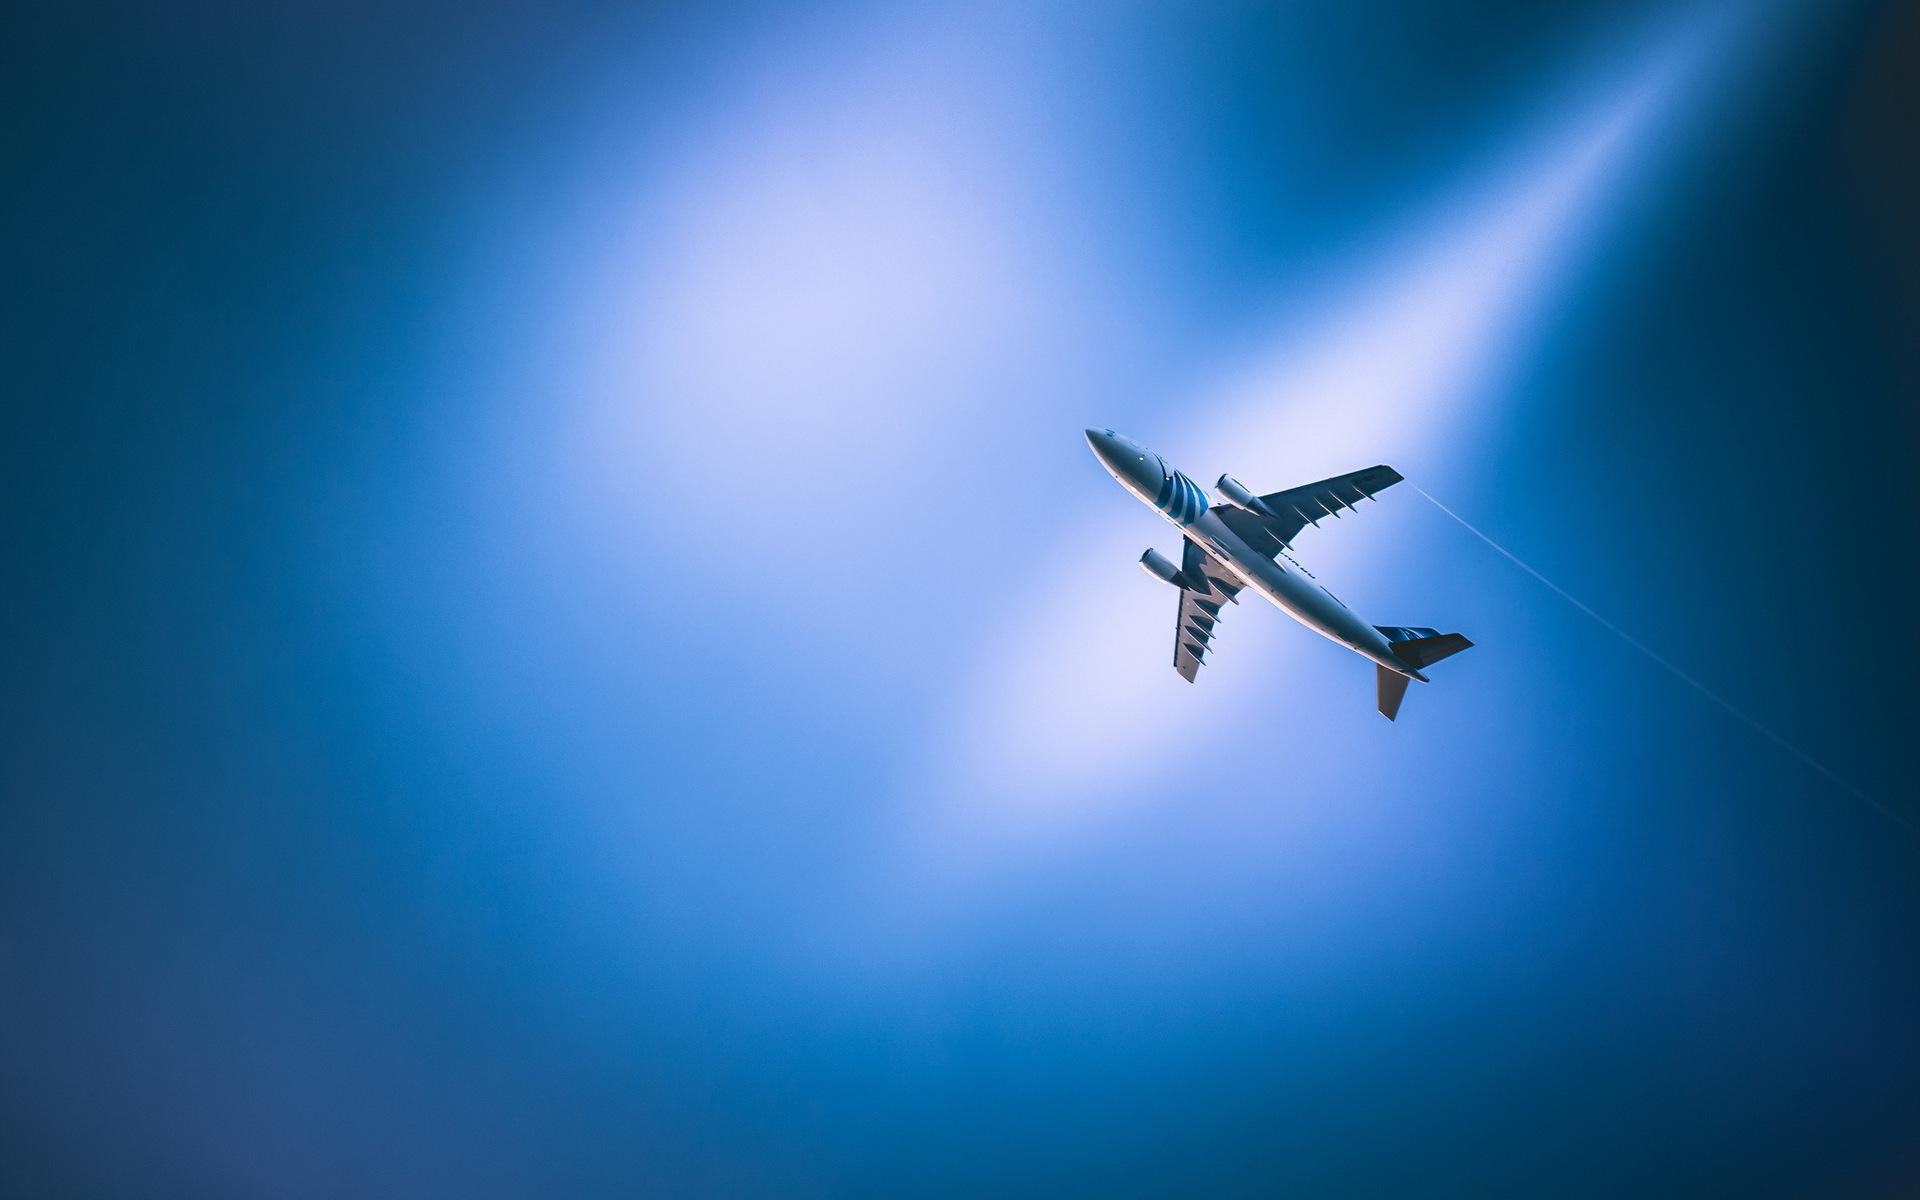 aeroplane-qhd.jpg